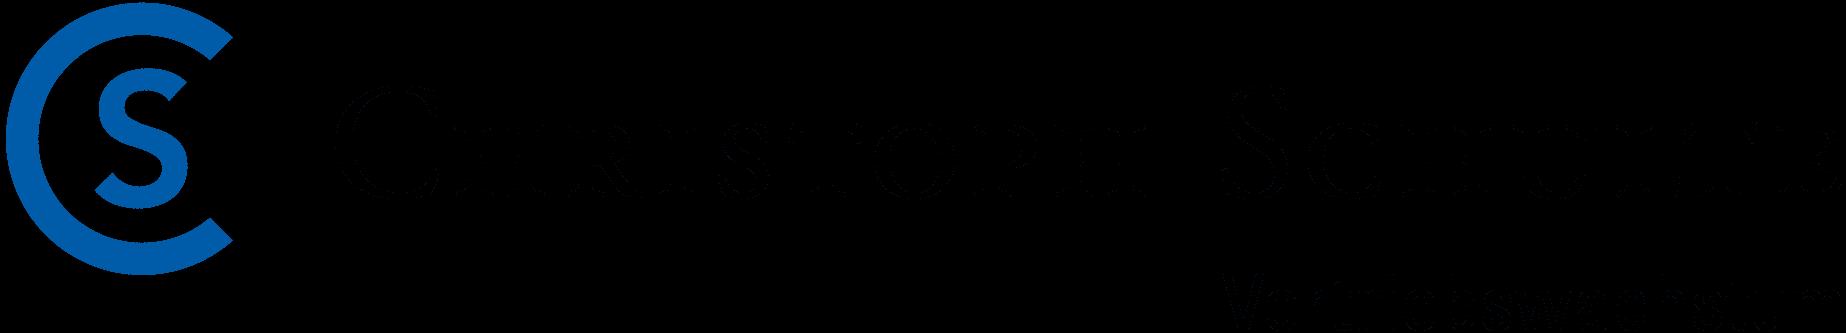 CSVertriebswachstum-Logo